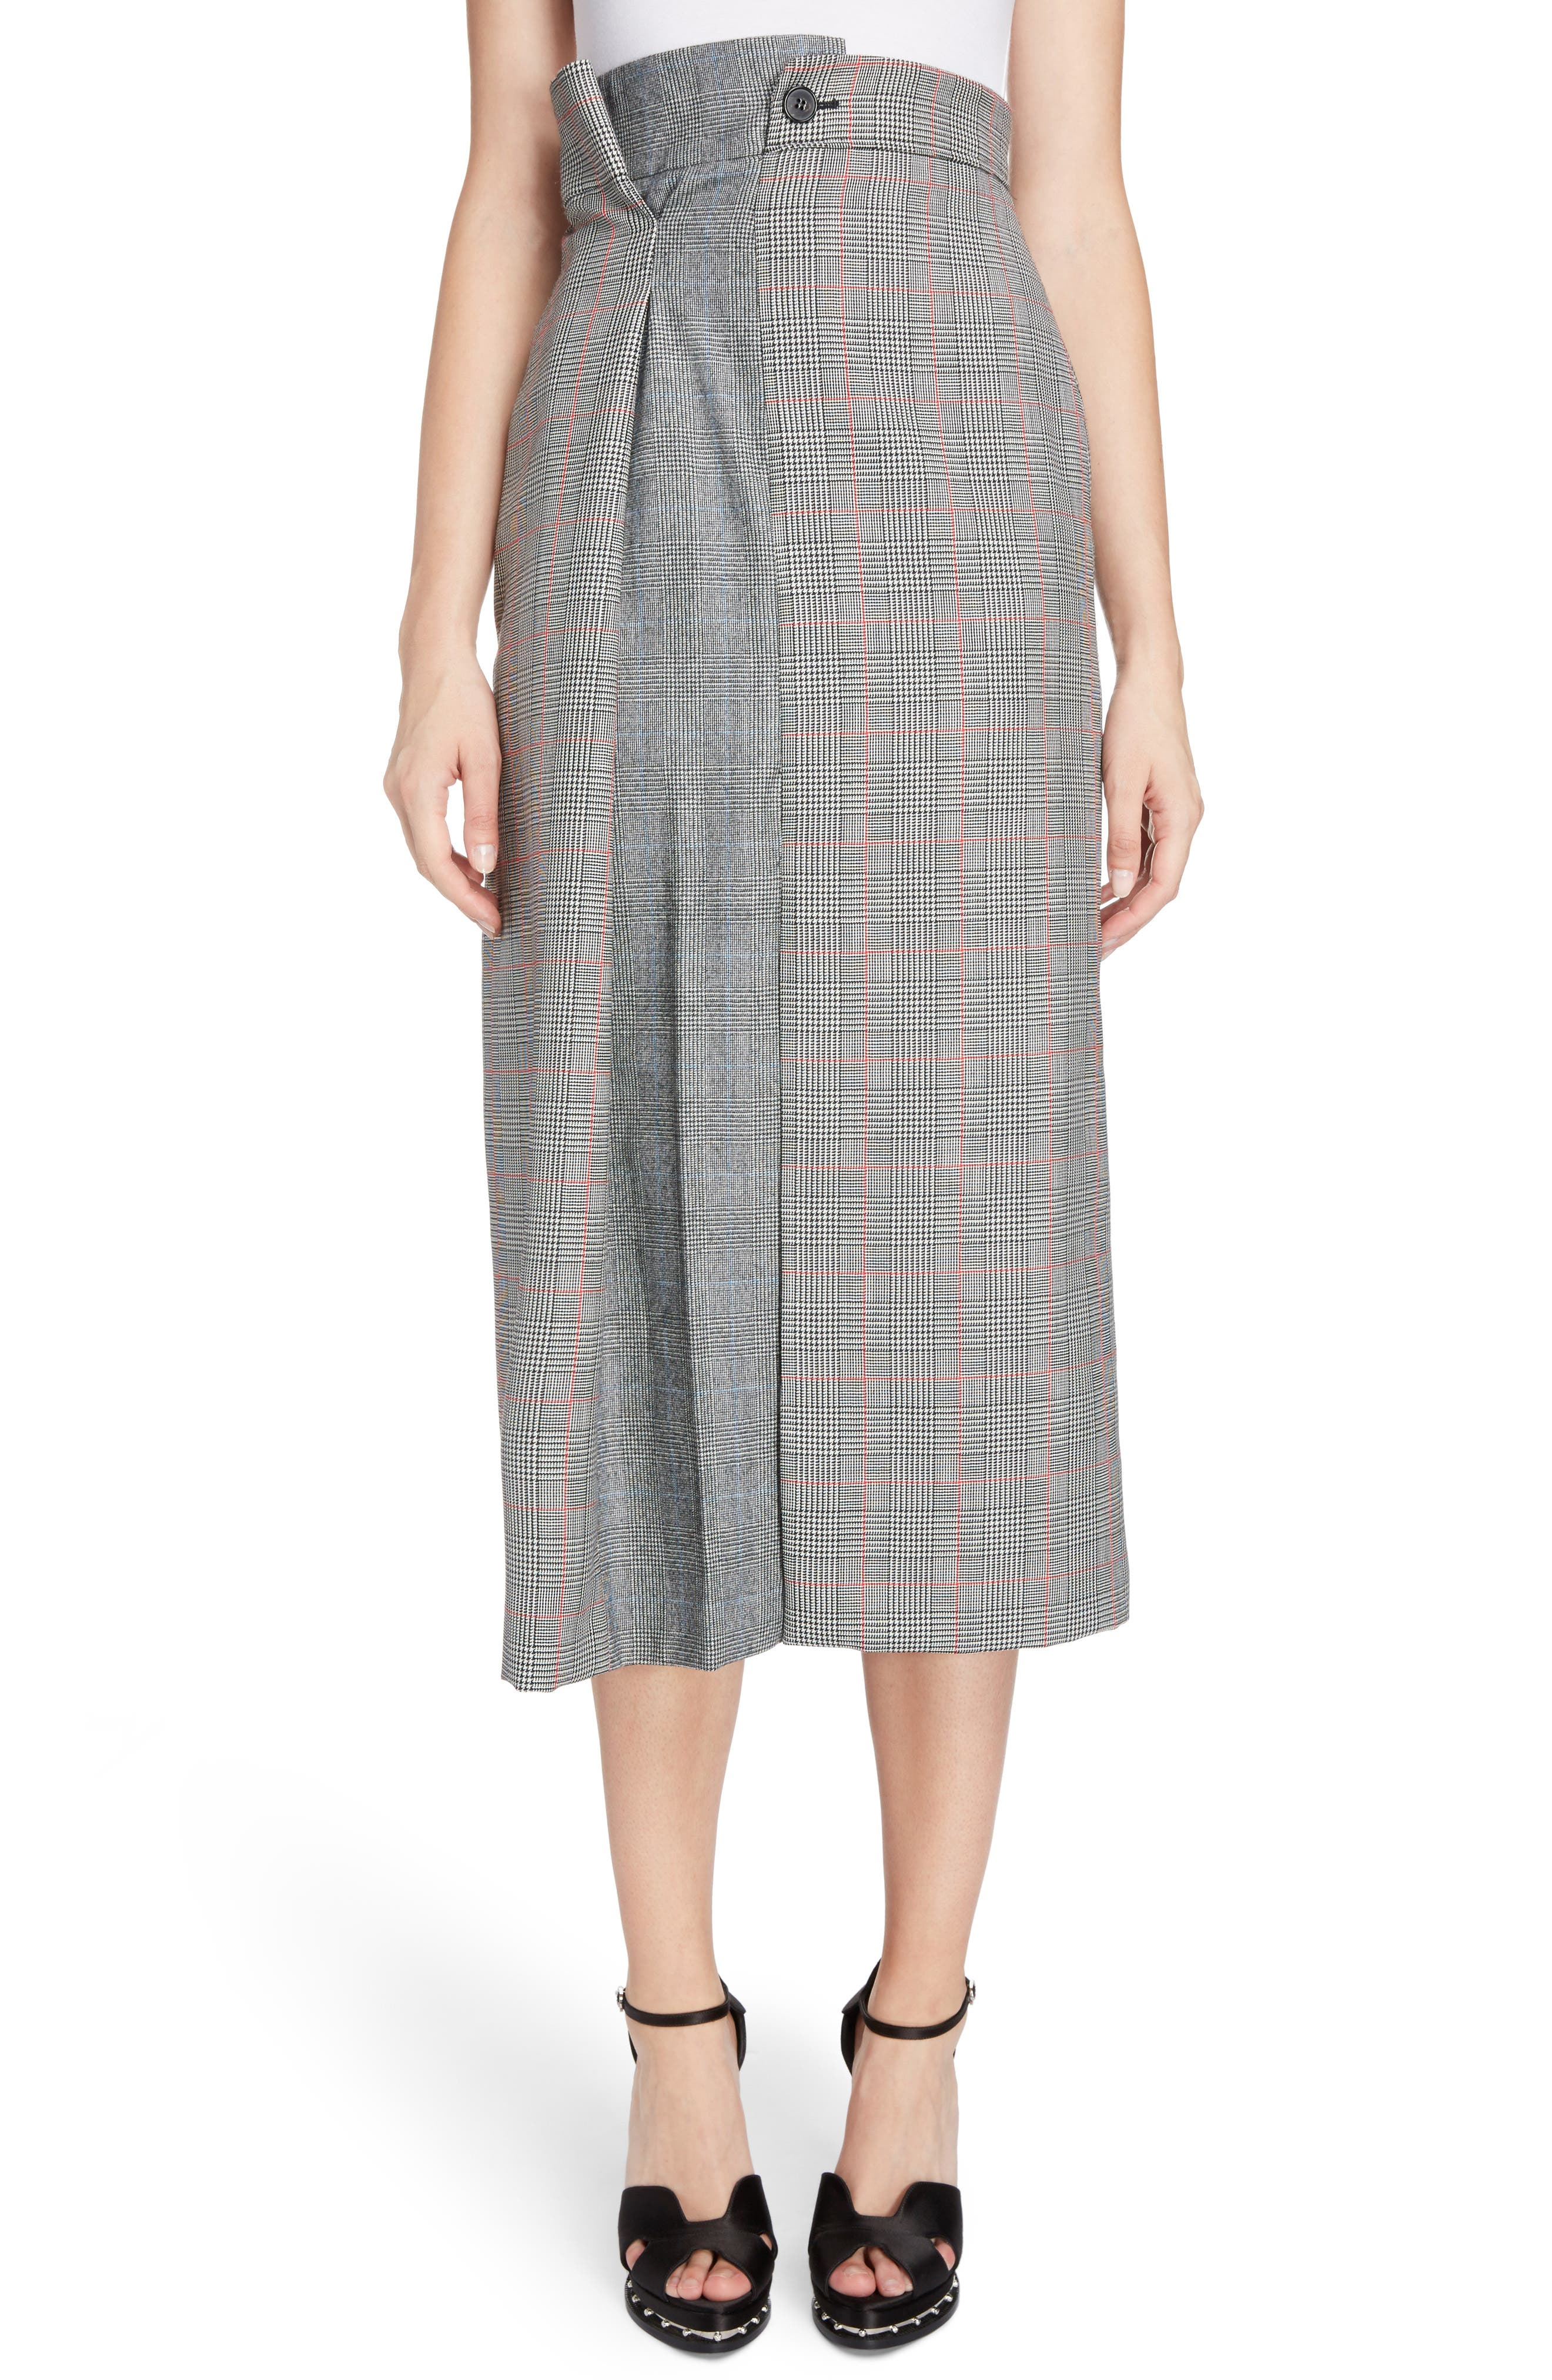 Prince of Wales Check Midi Skirt,                             Main thumbnail 1, color,                             086